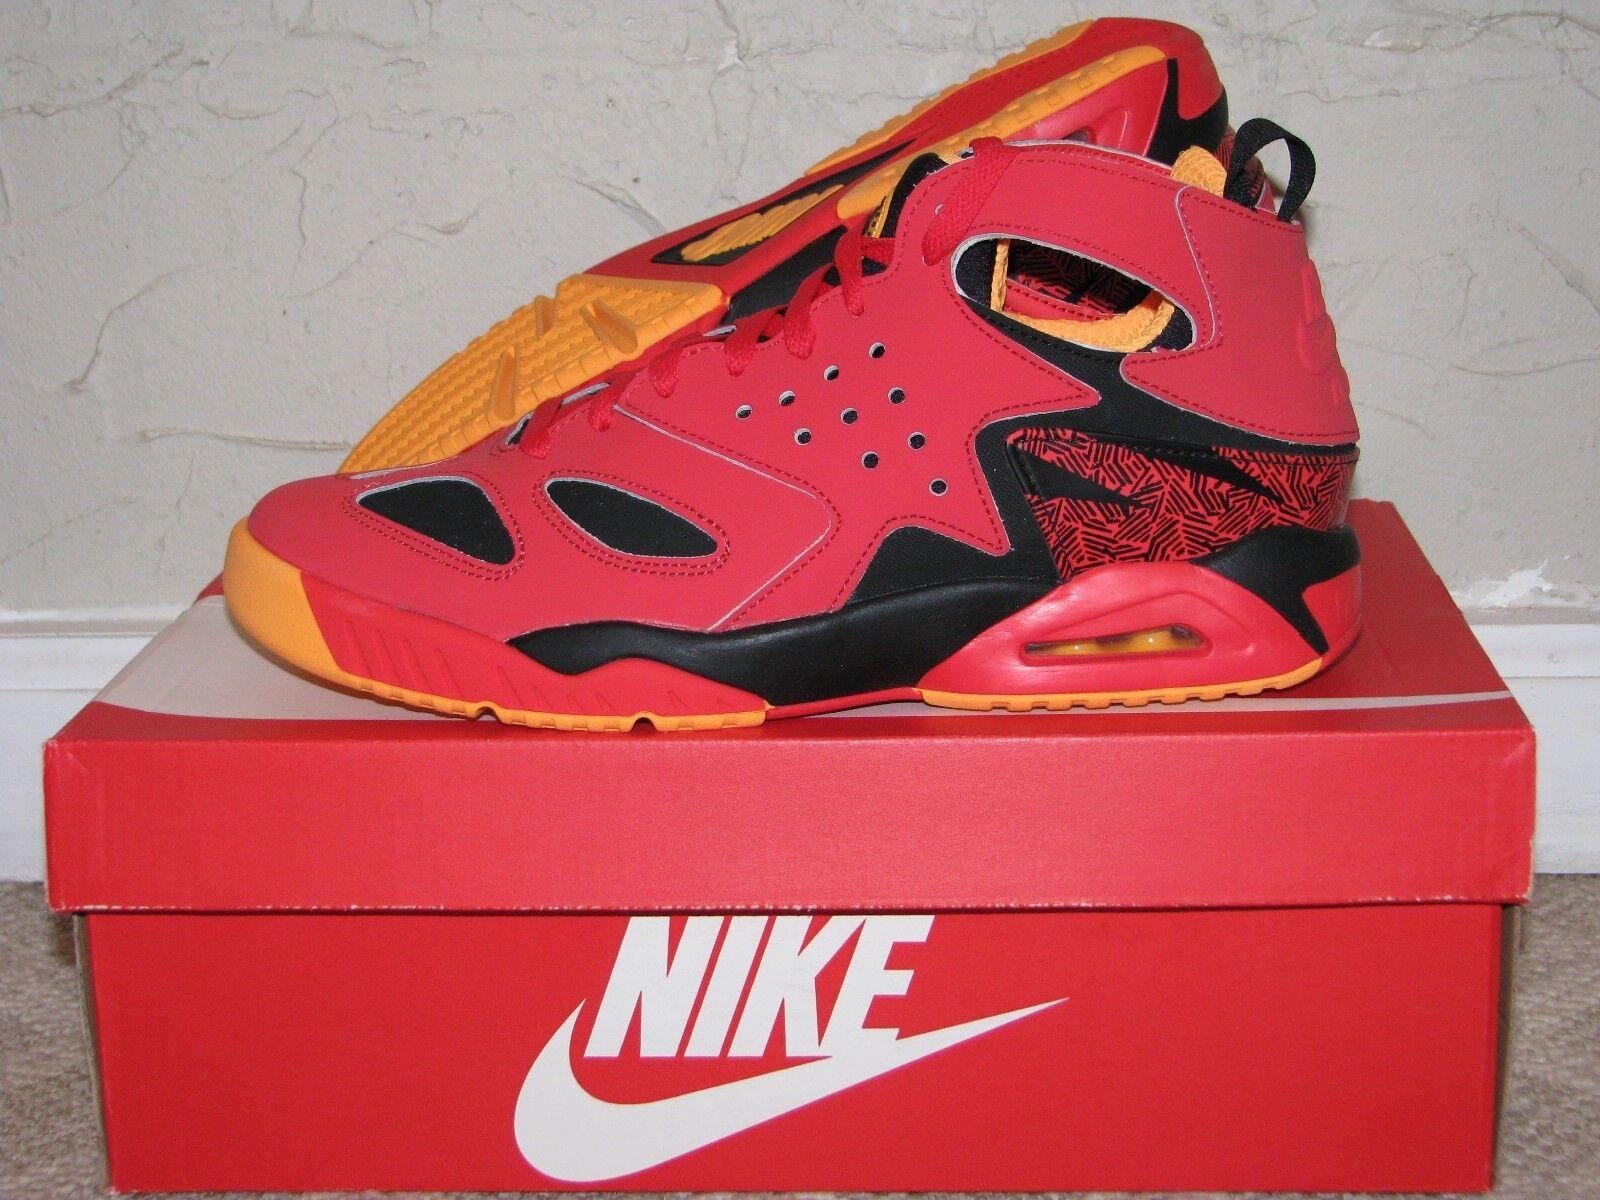 Nike rosso air tech sfida huarache rosso Nike / nero taglia 10 s new 630957-600 Uomo 16b84b